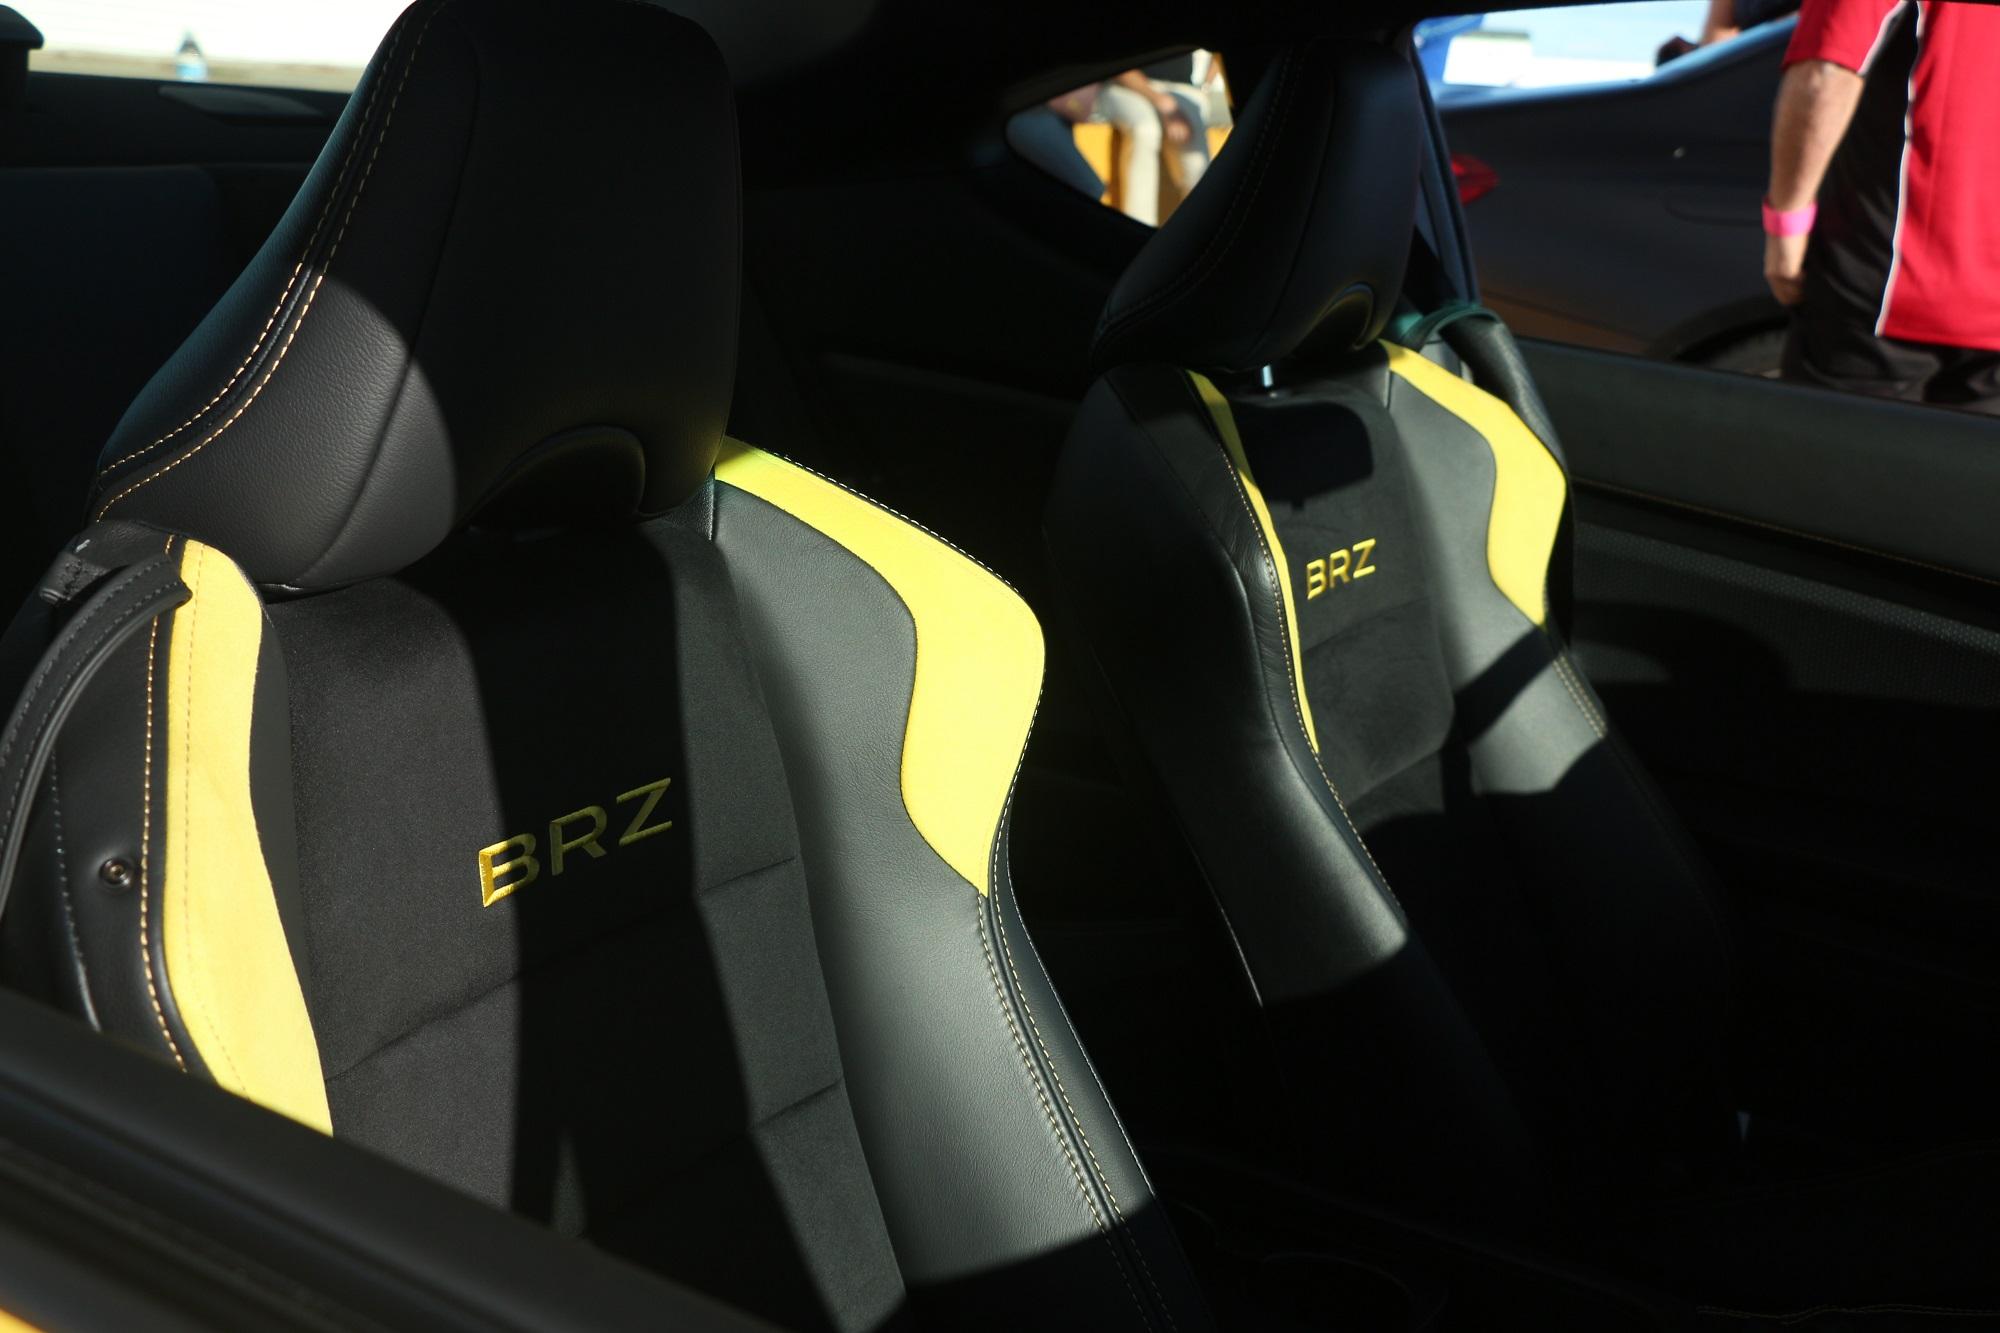 Scionlife.com 2018 Subaru BRZ Performance Package Toyota GT86 86 Review Track Test